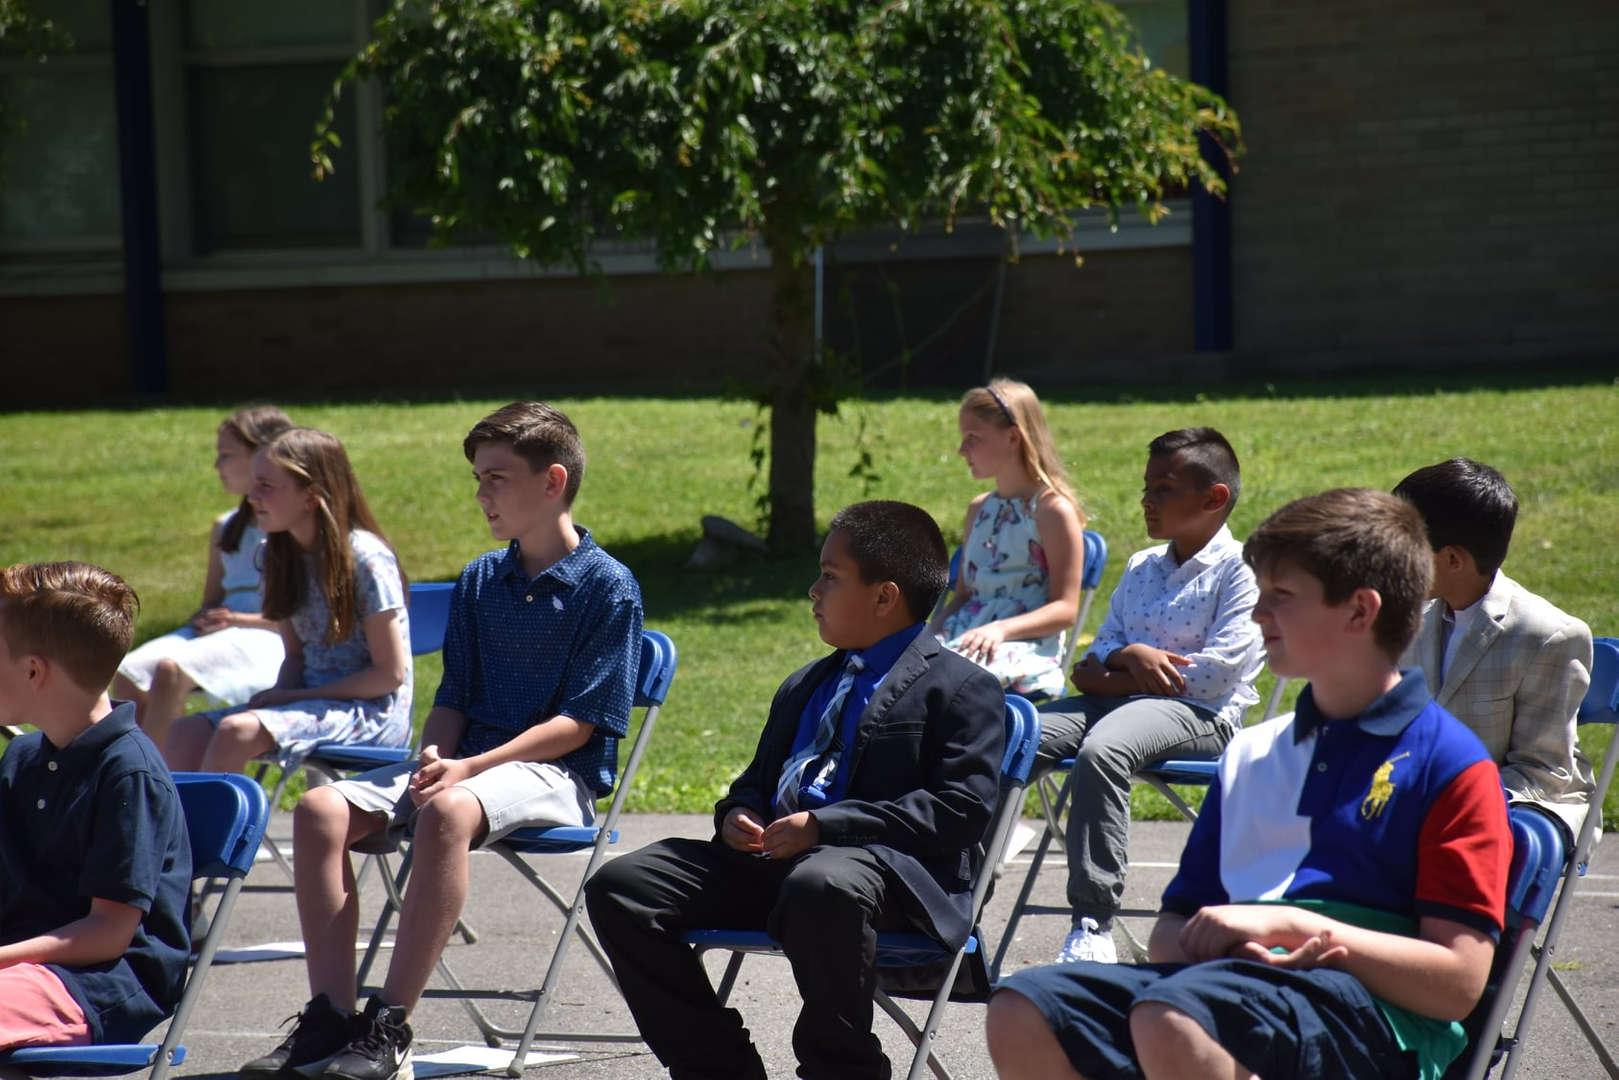 Franklin Avenue Grade 4 Promotion held on 6/17/21.